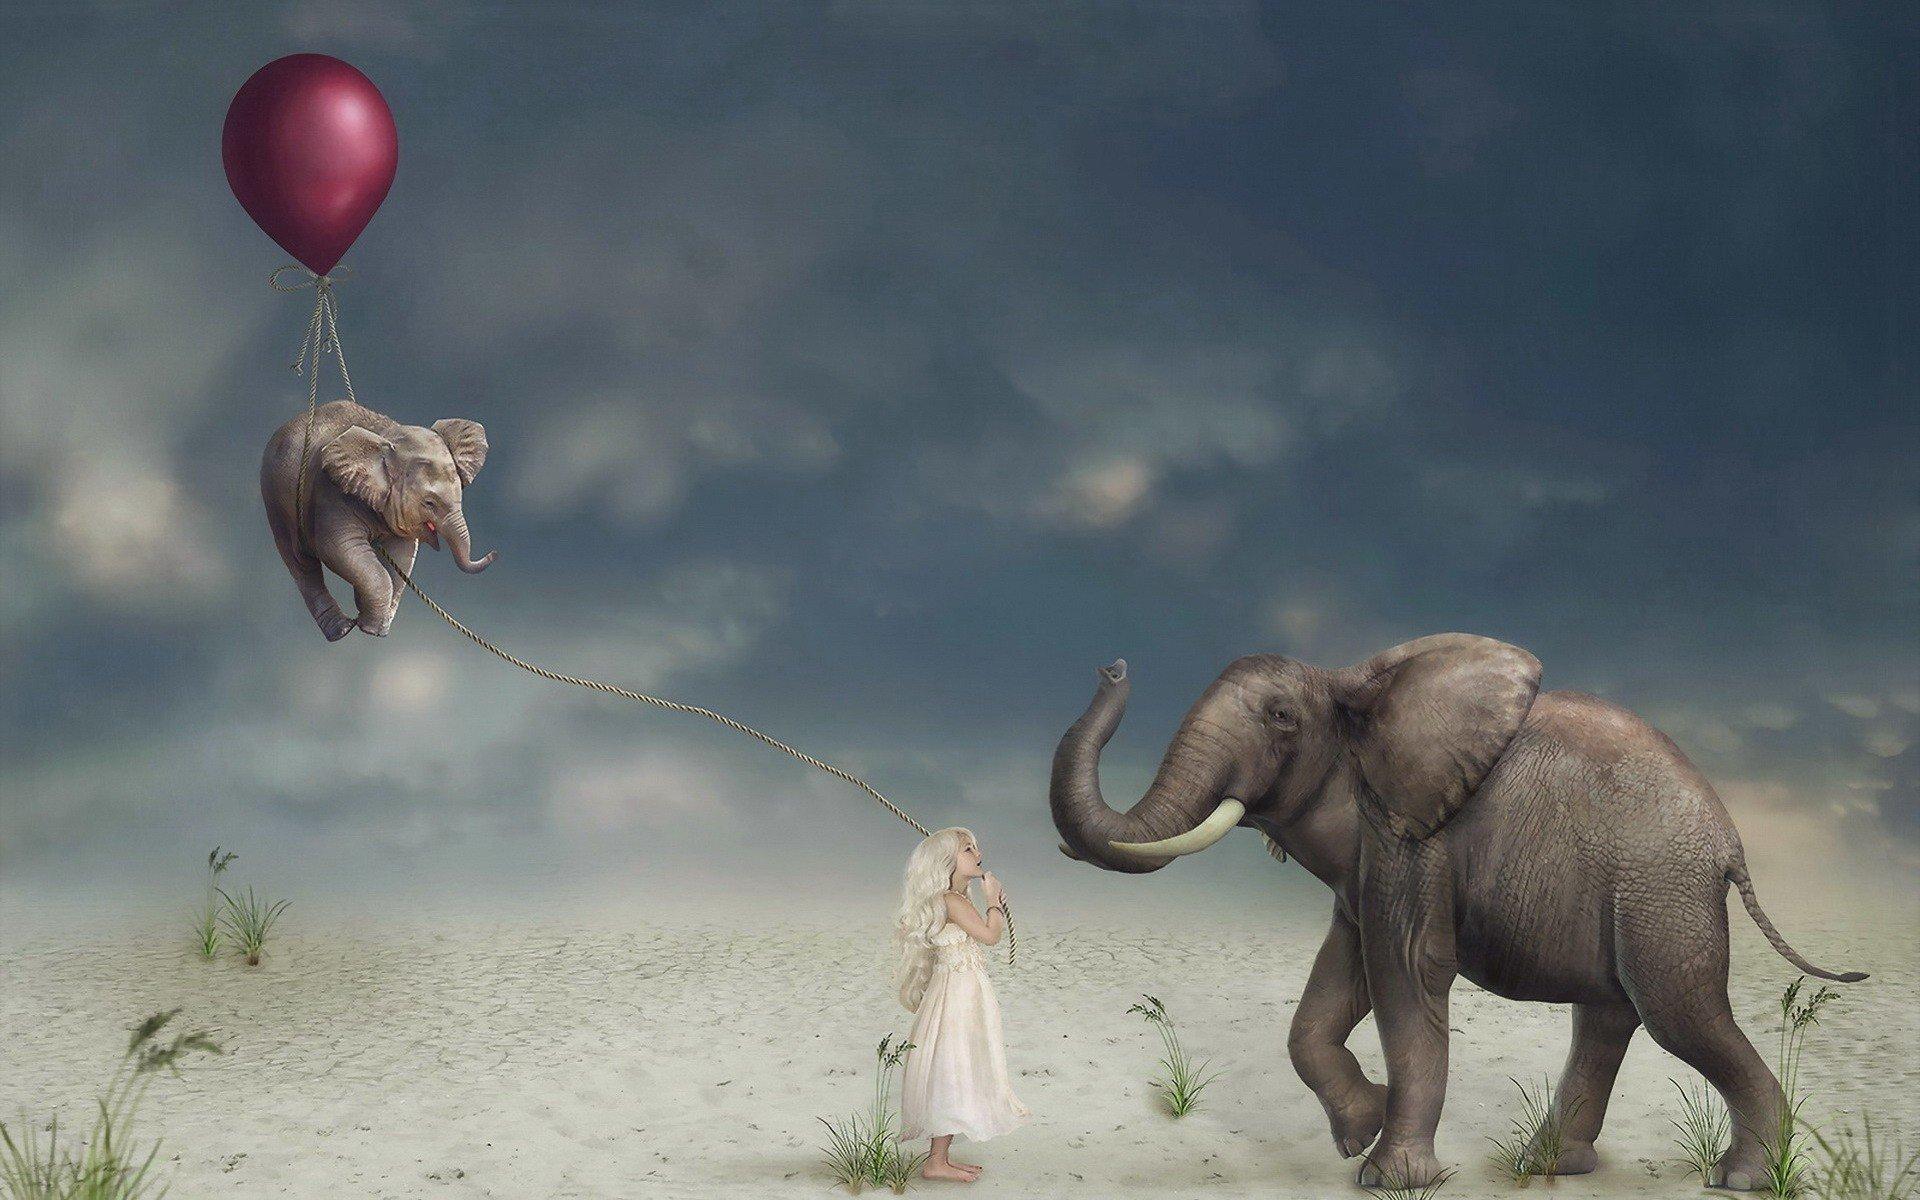 Cute Elephant Design Wallpaper Children Artwork Balloon Elephant Animals Surreal Hd